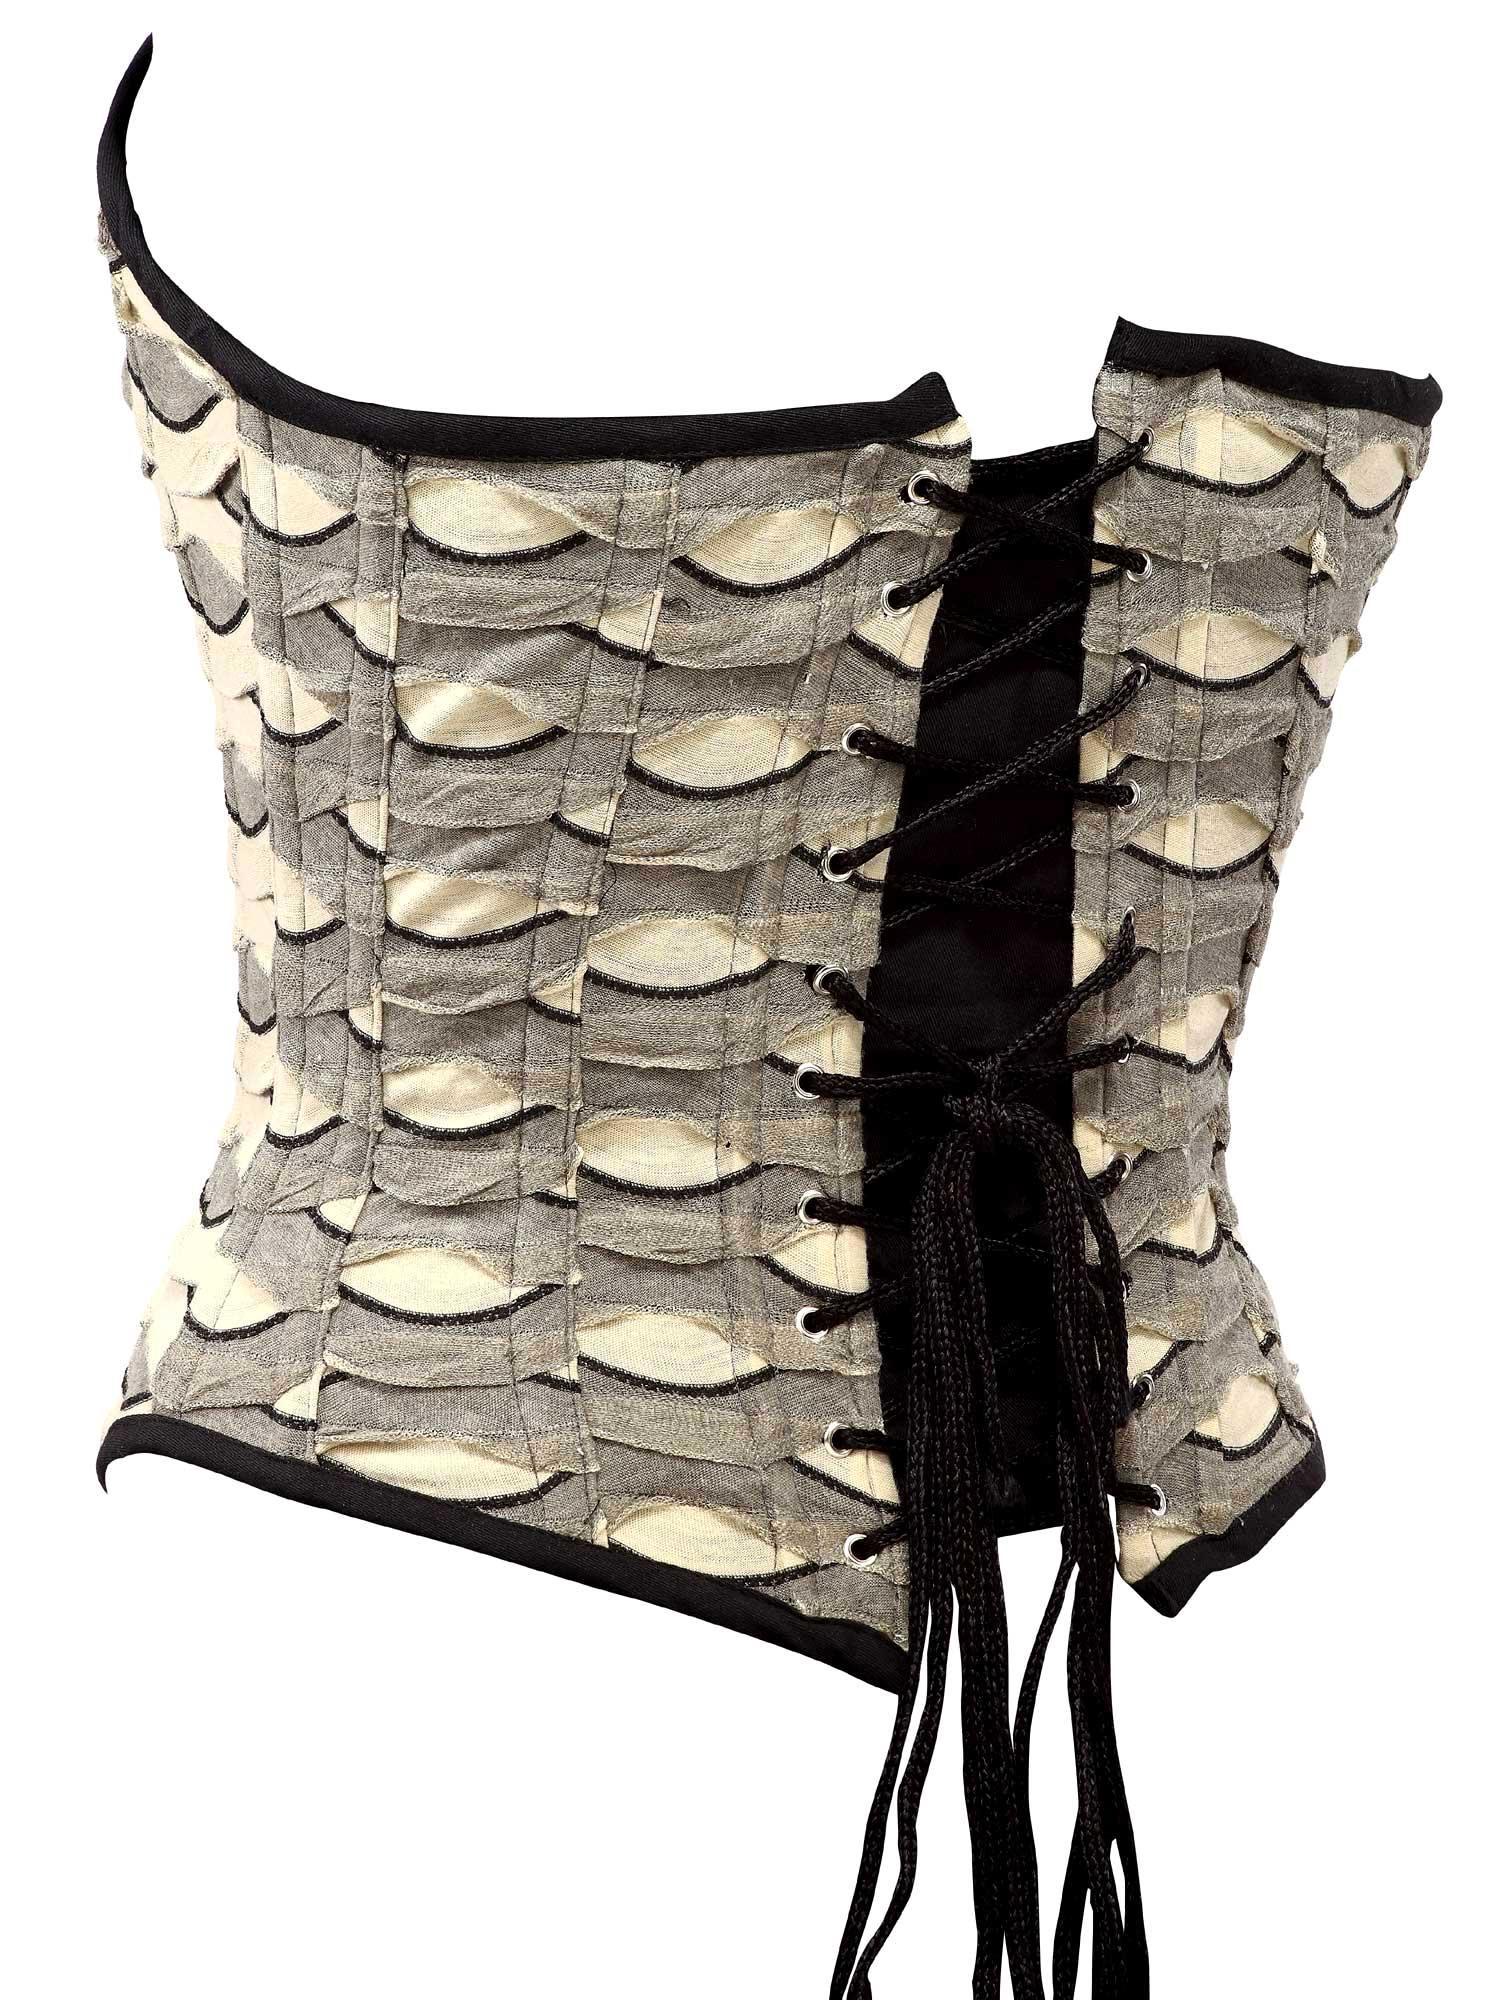 shredded_fabric_cutwork_steel_boning_corset_waist_cincher_bustier_bustiers_and_corsets_3.jpg